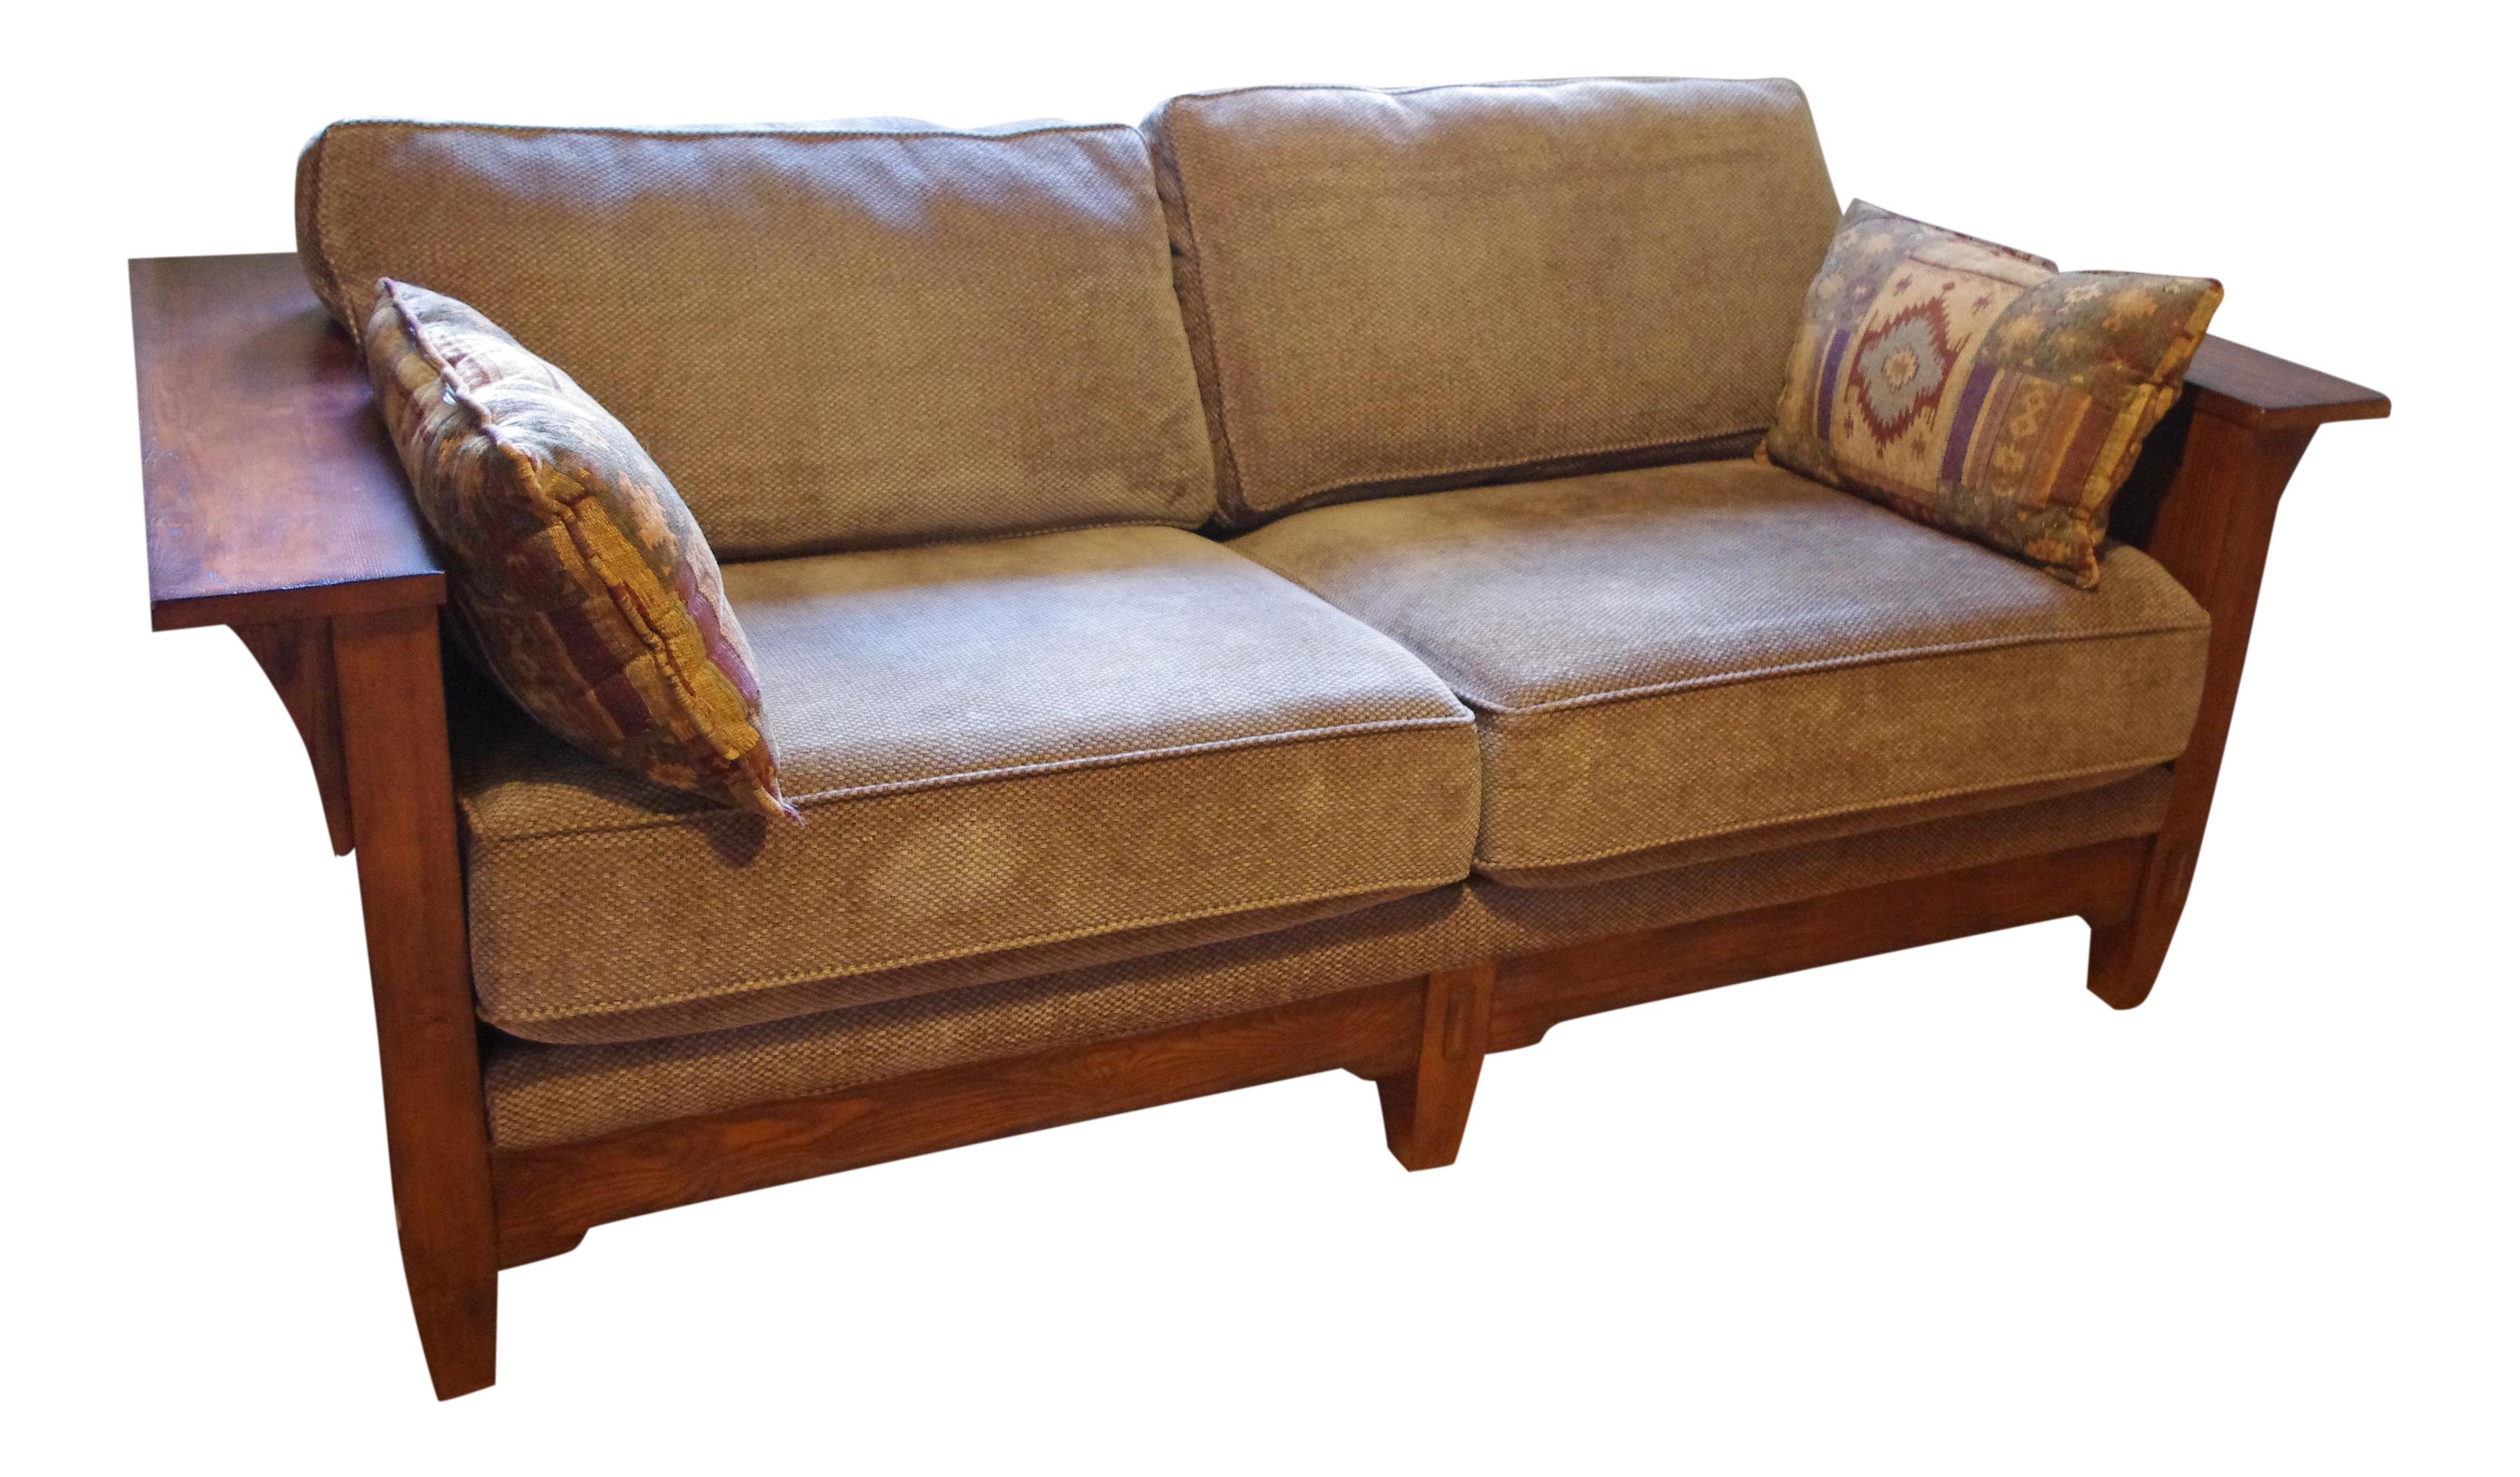 Tremendous Flexsteel Mission Arts And Crafts Style Oak Sofa Uwap Interior Chair Design Uwaporg